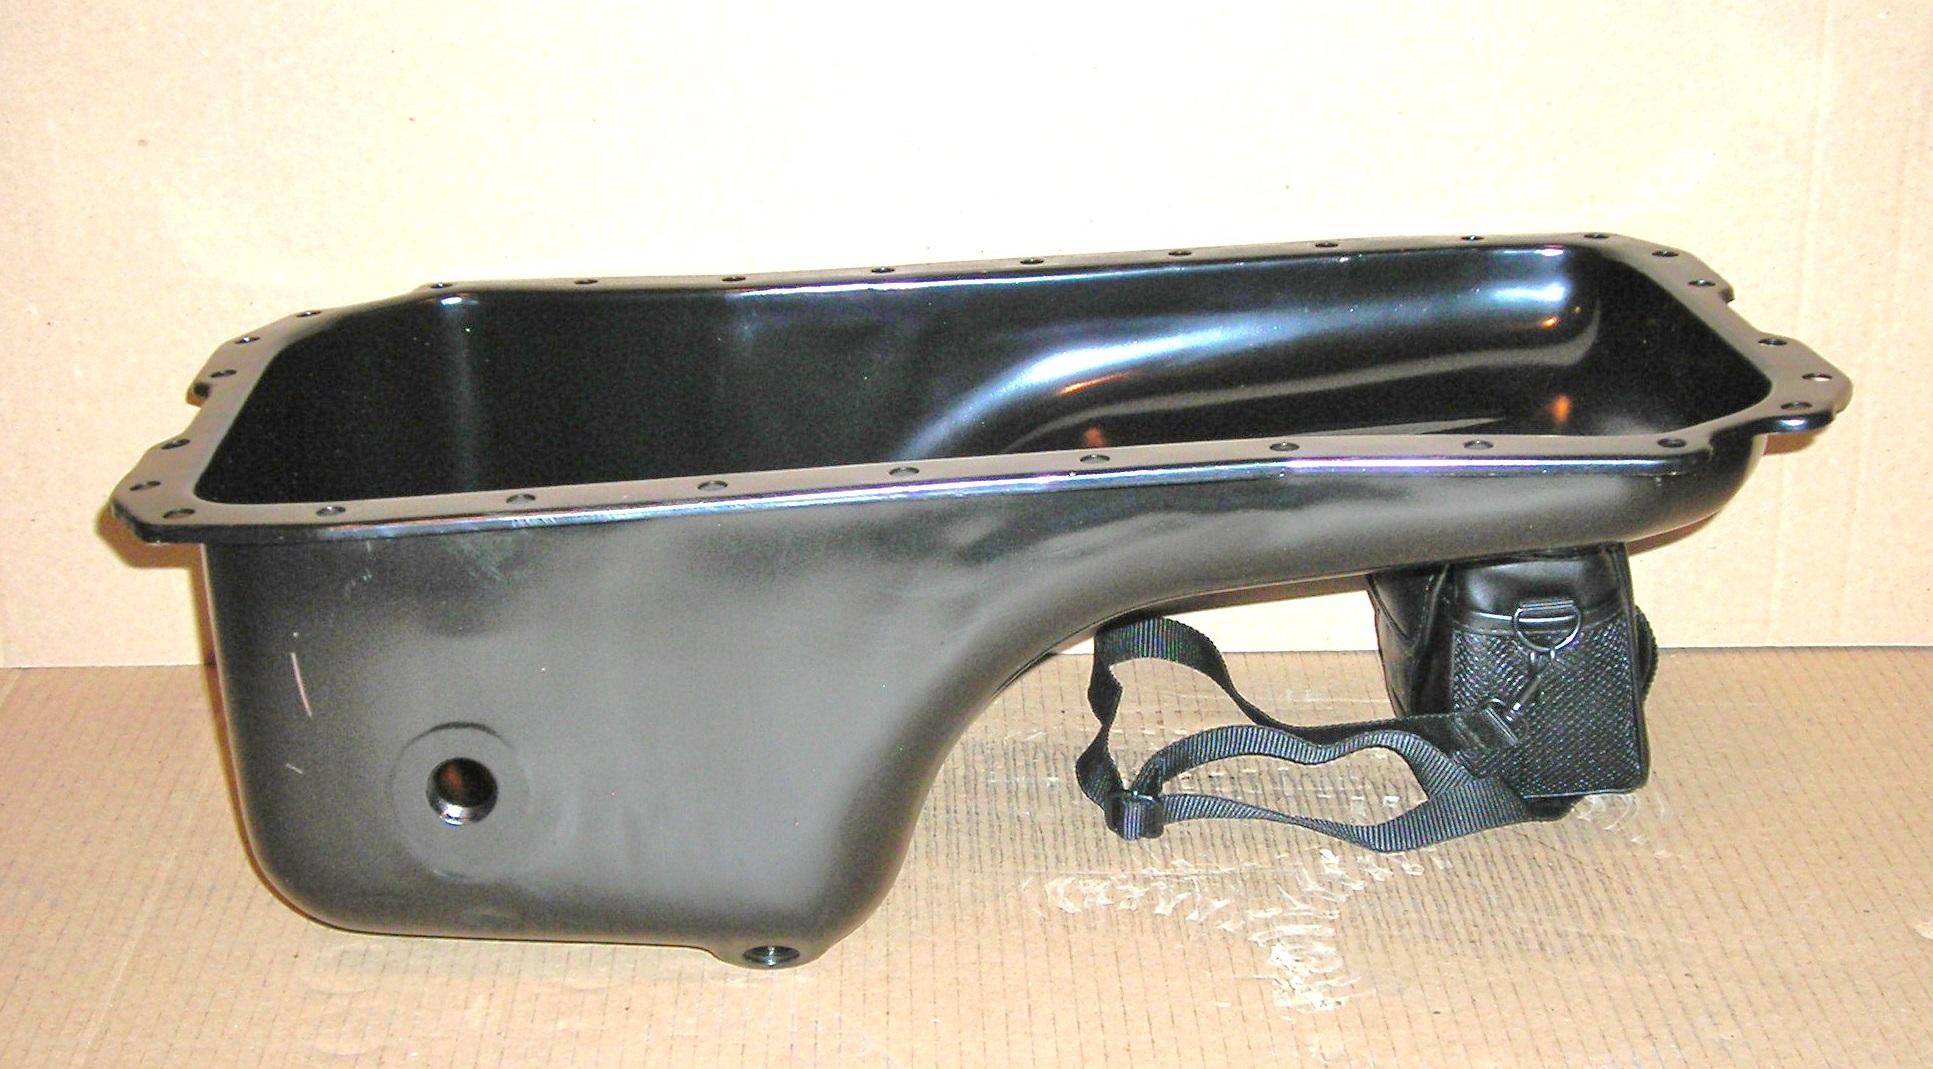 3901049-Cummins Oil Pan - View #1 - fixed